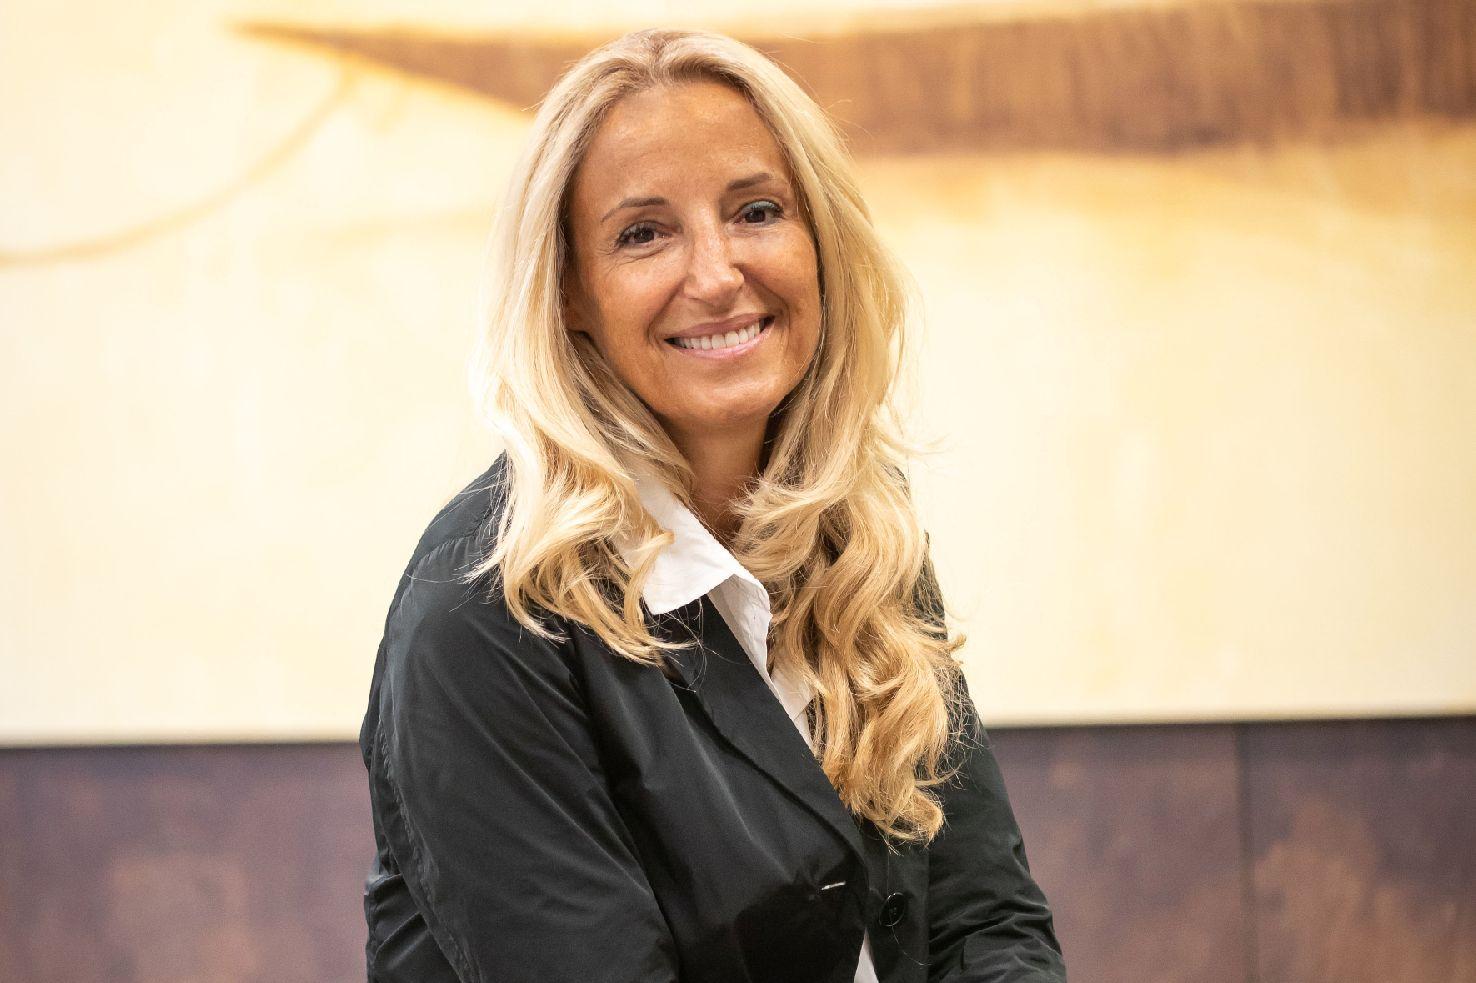 María Helena Antolín, vicepresidenta Grupo Antolín, automoción, empresa, empleo.